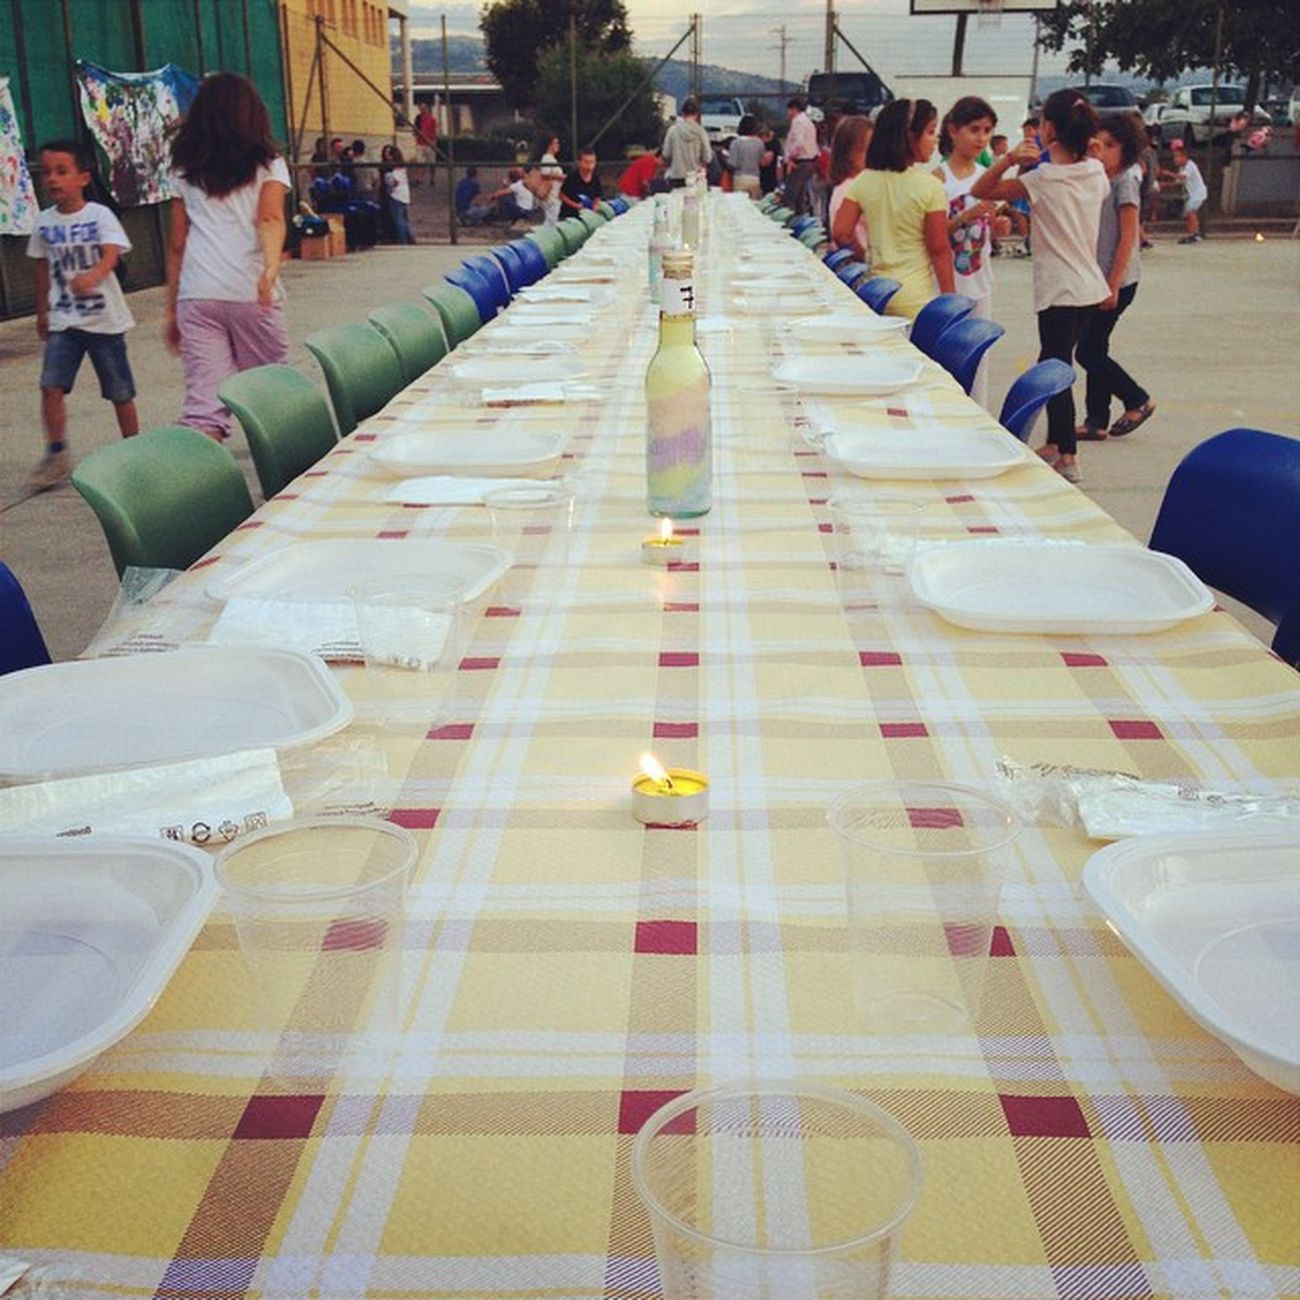 Cena di fine estate (ma quando mai è iniziata?) #campoestivo #pratissolo #estate2014 #kidsjustwantohavefun #cena #people #community